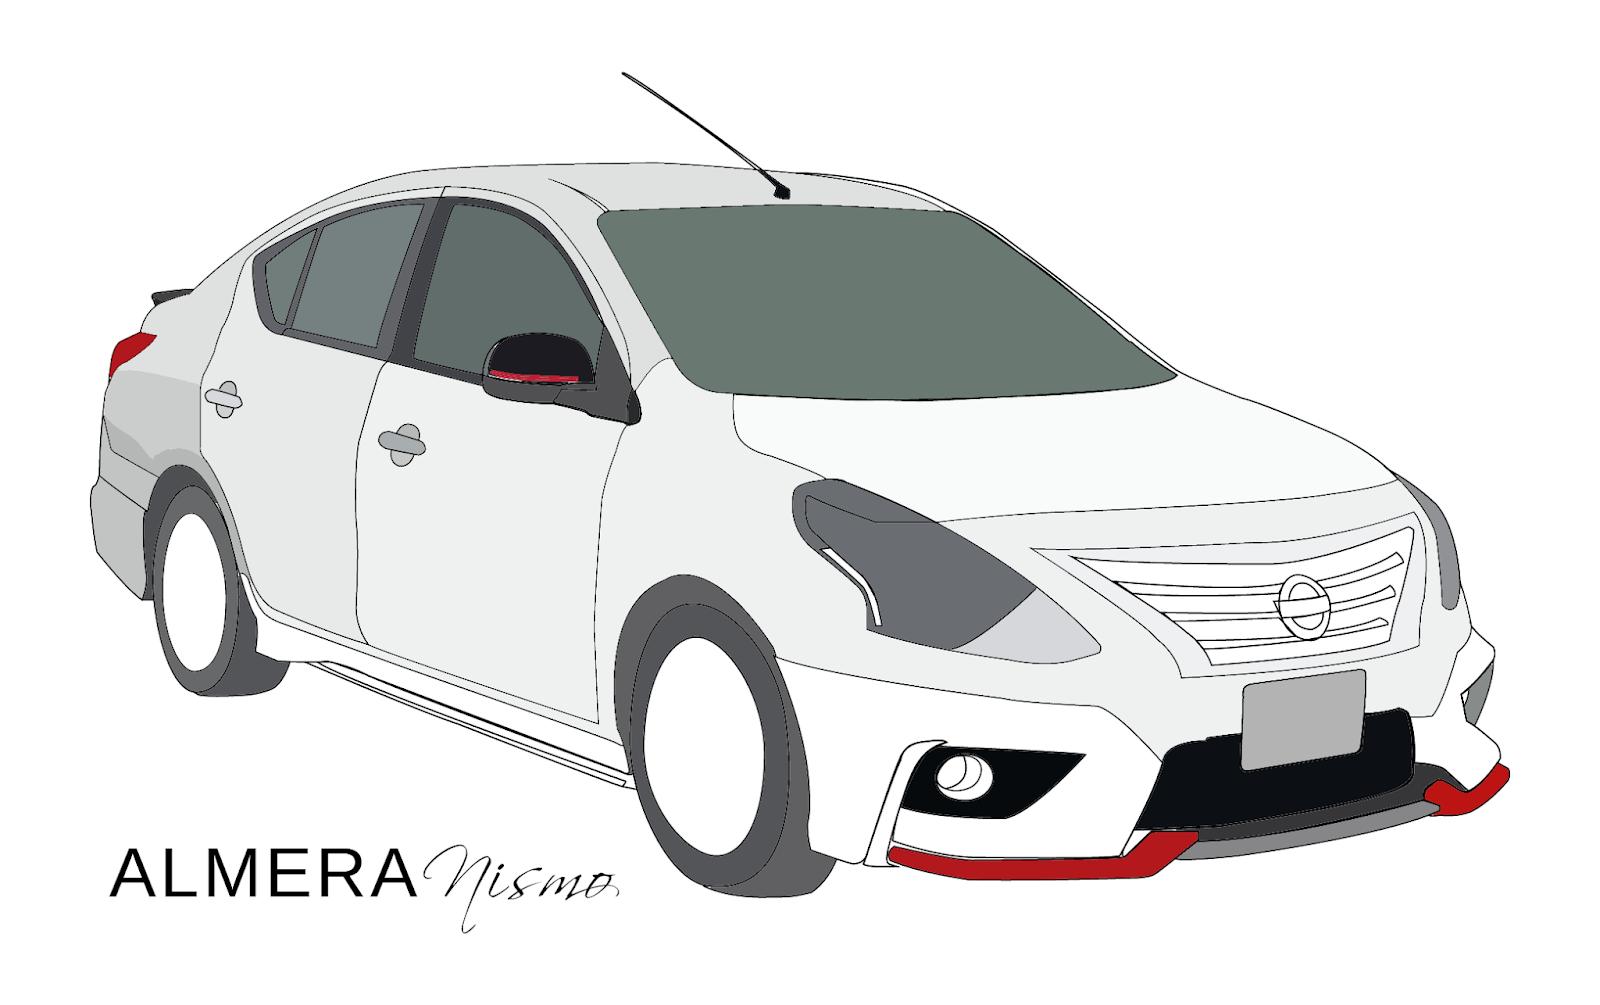 Tracing Vector Nissan Almera Nismo 2016 Black Entri Yang Lain